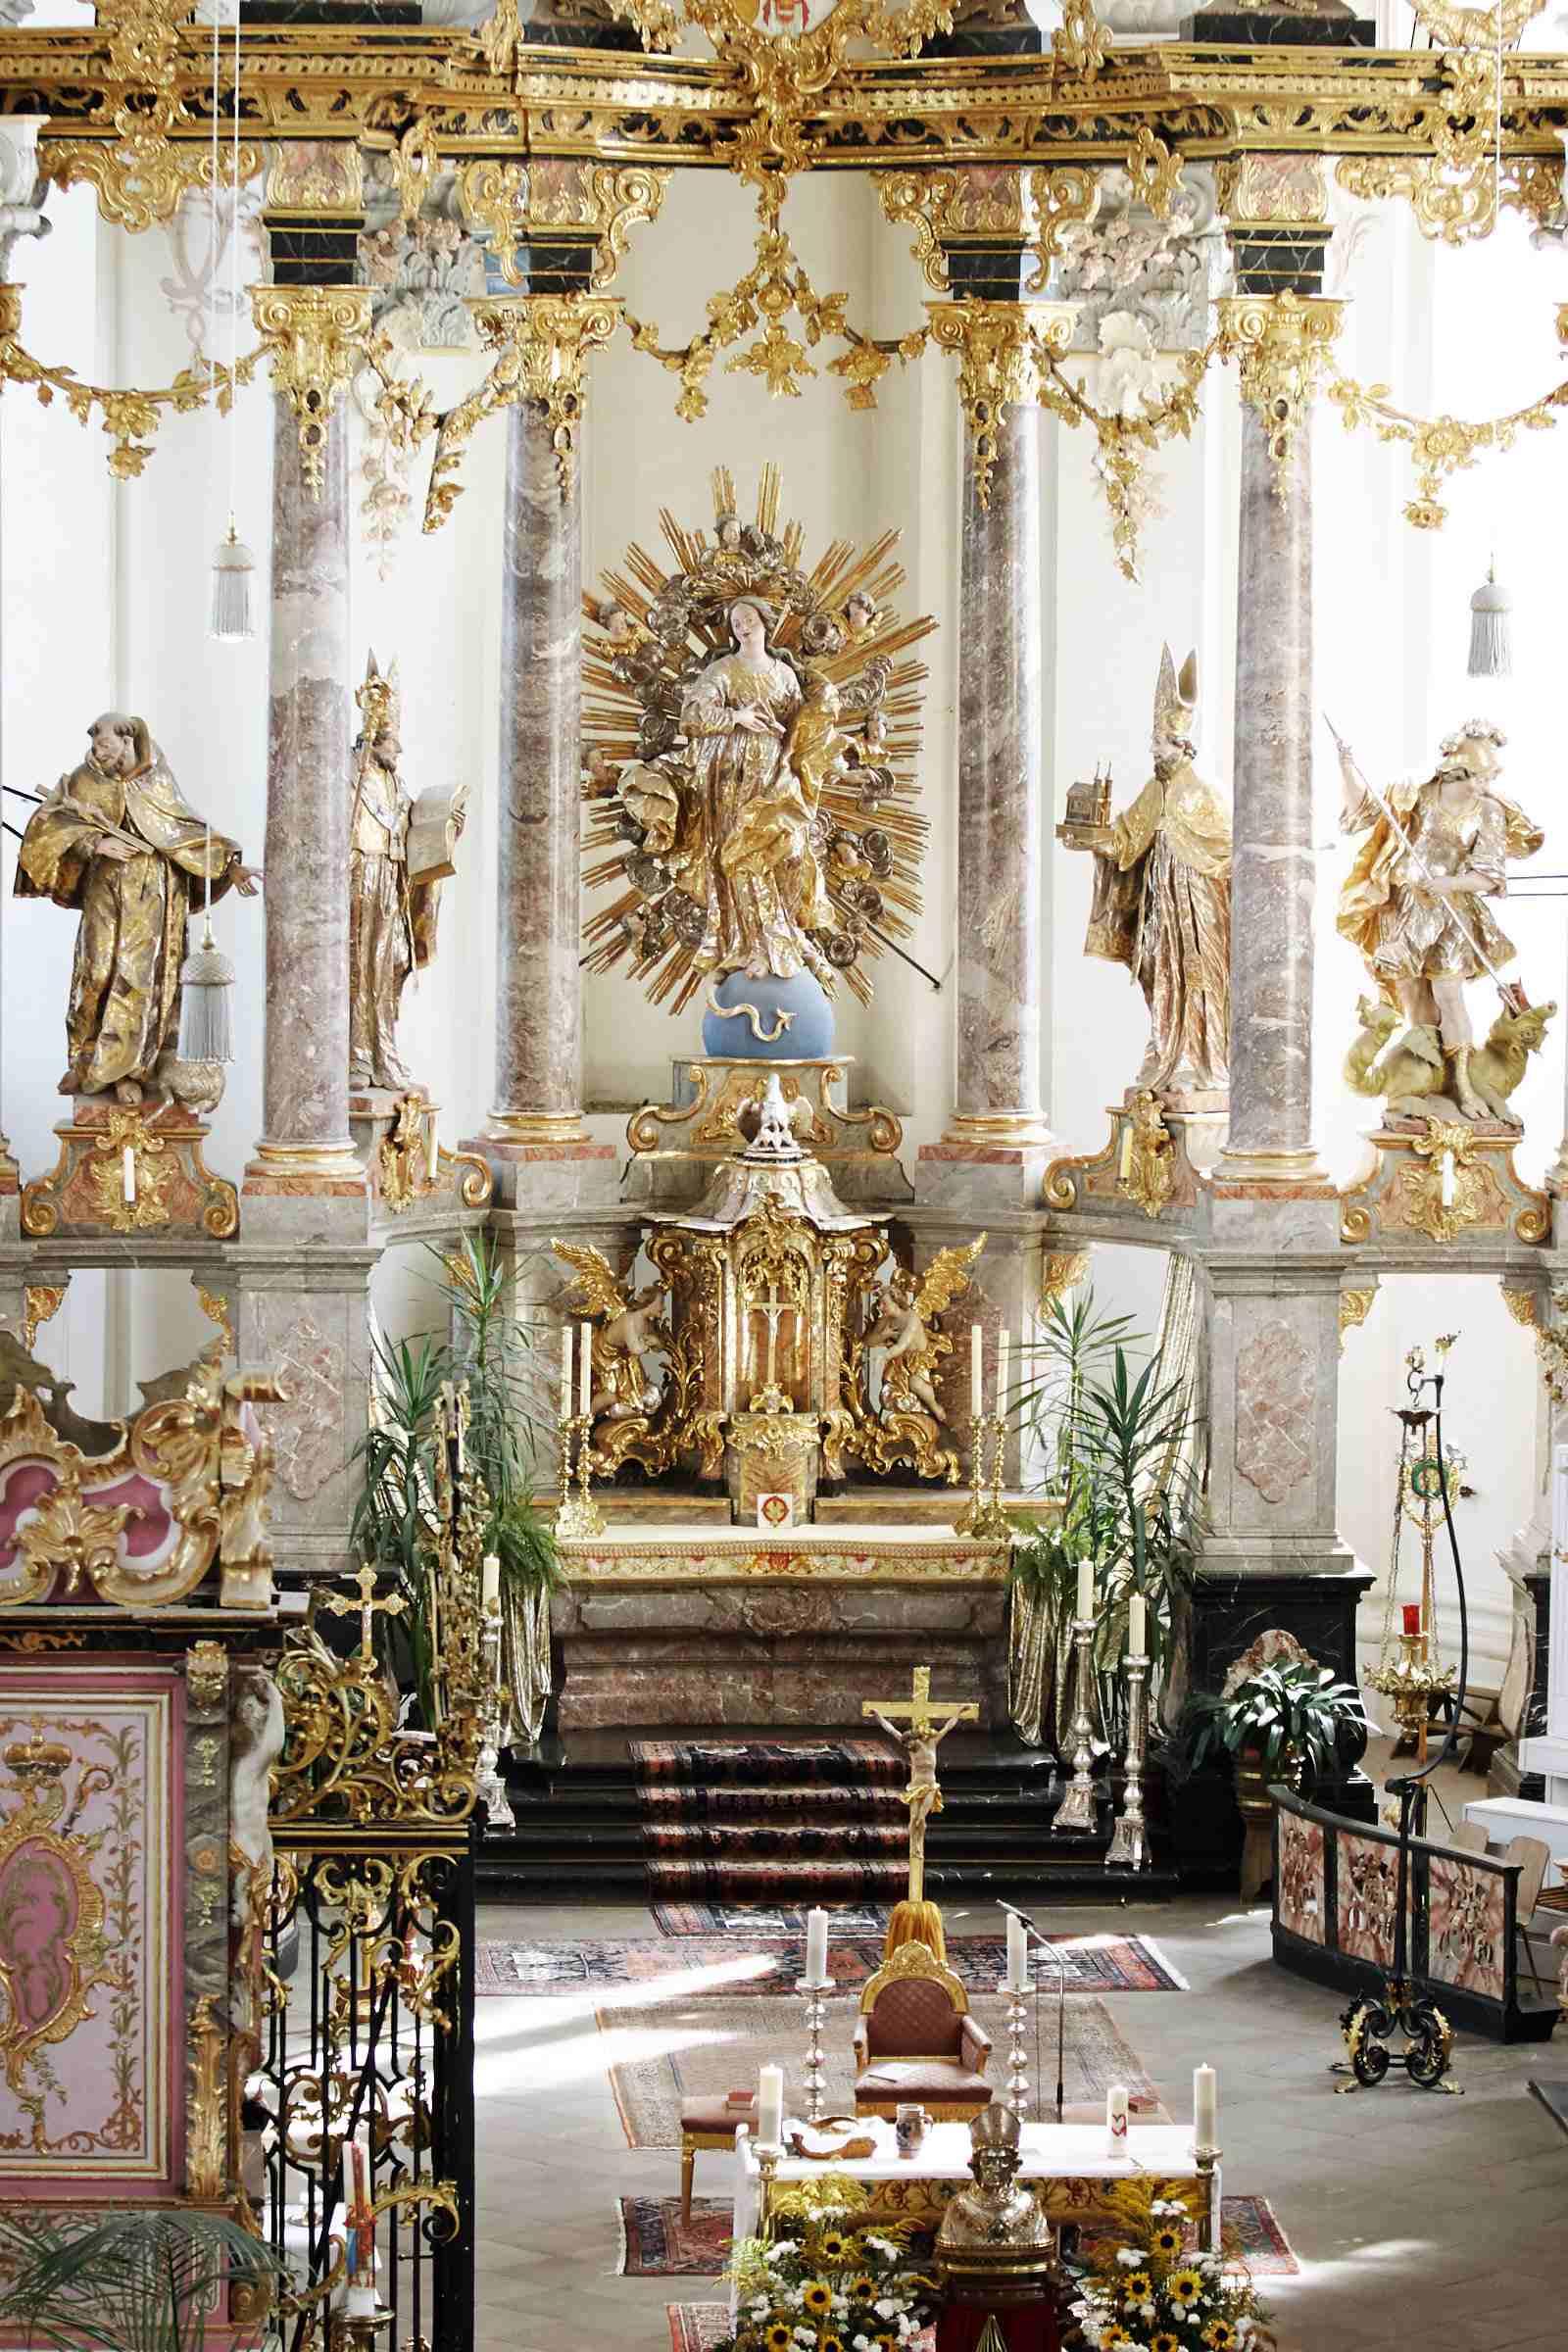 Fotografie der Kirche St. Paulin Trier